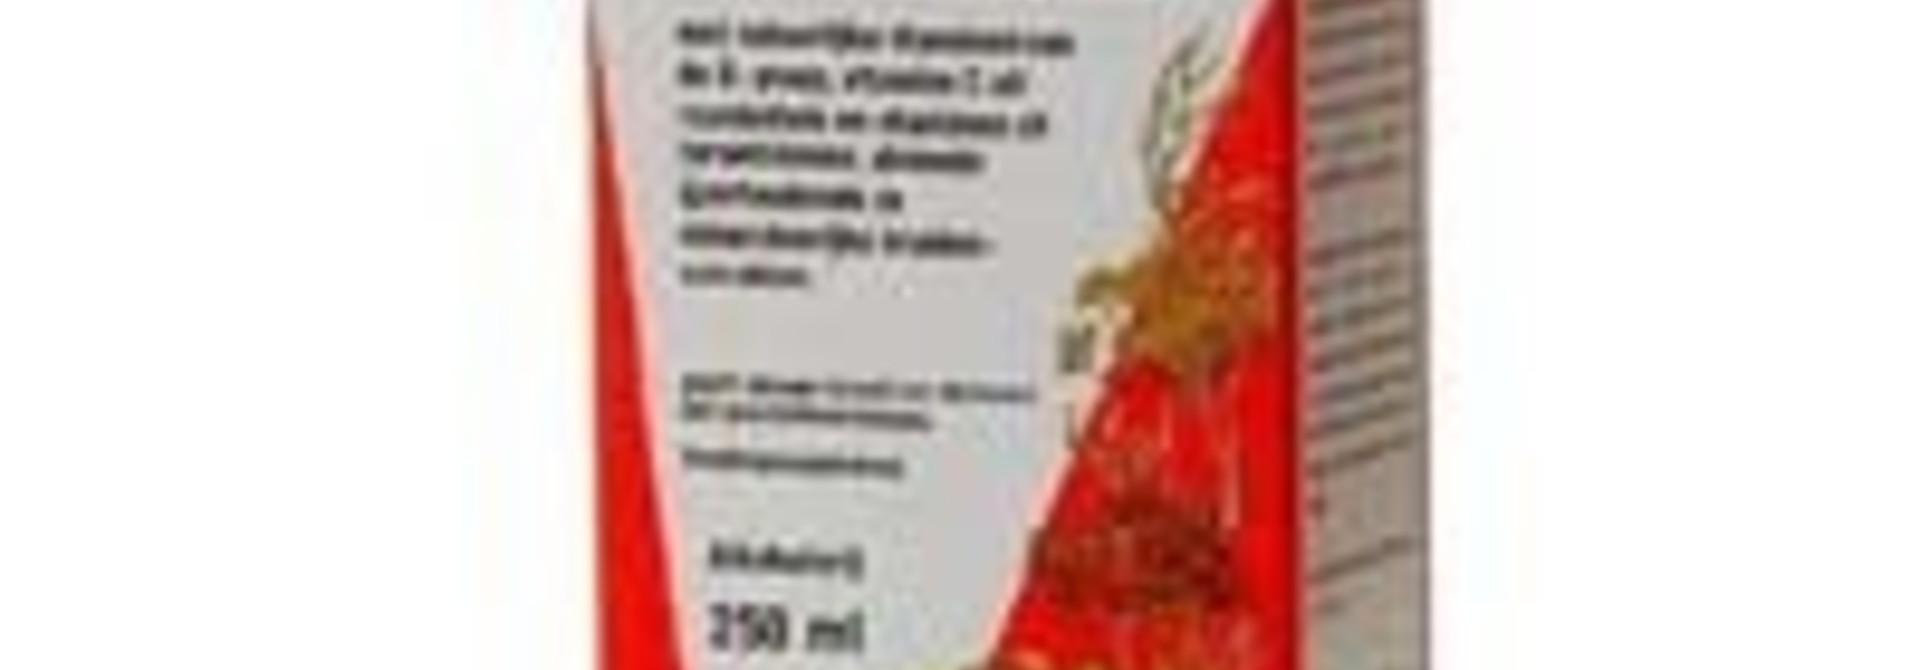 Floradix Tabletten 84 tabletten